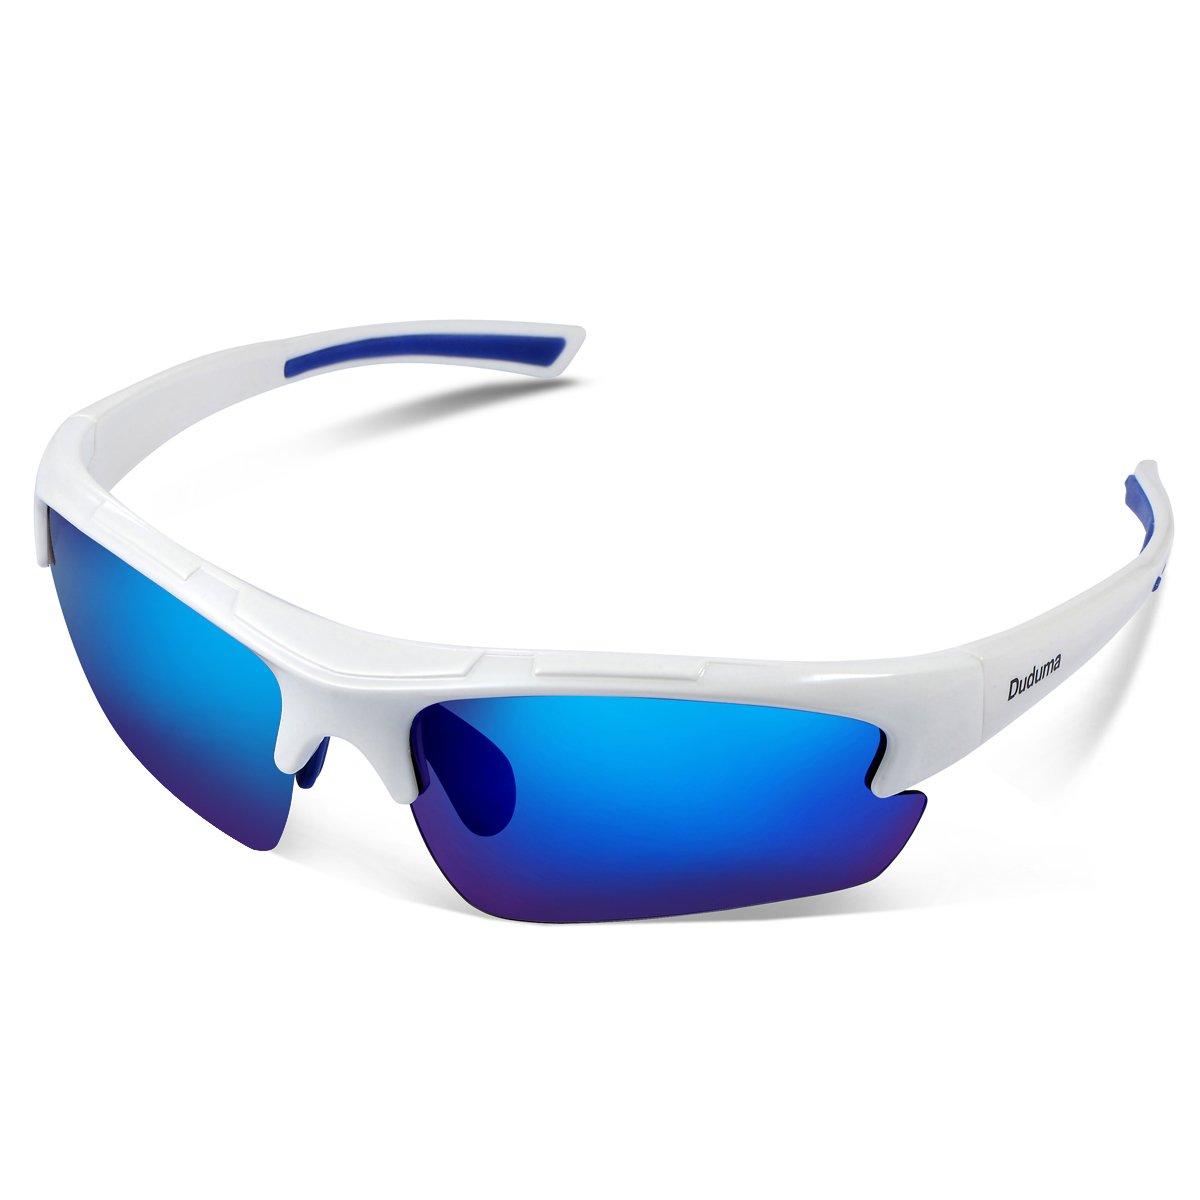 85c8c62a79b Duduma Polarized Designer Fashion Sports Sunglasses for Baseball Cycling  Fishing Golf Tr62 Superlight Frame product image